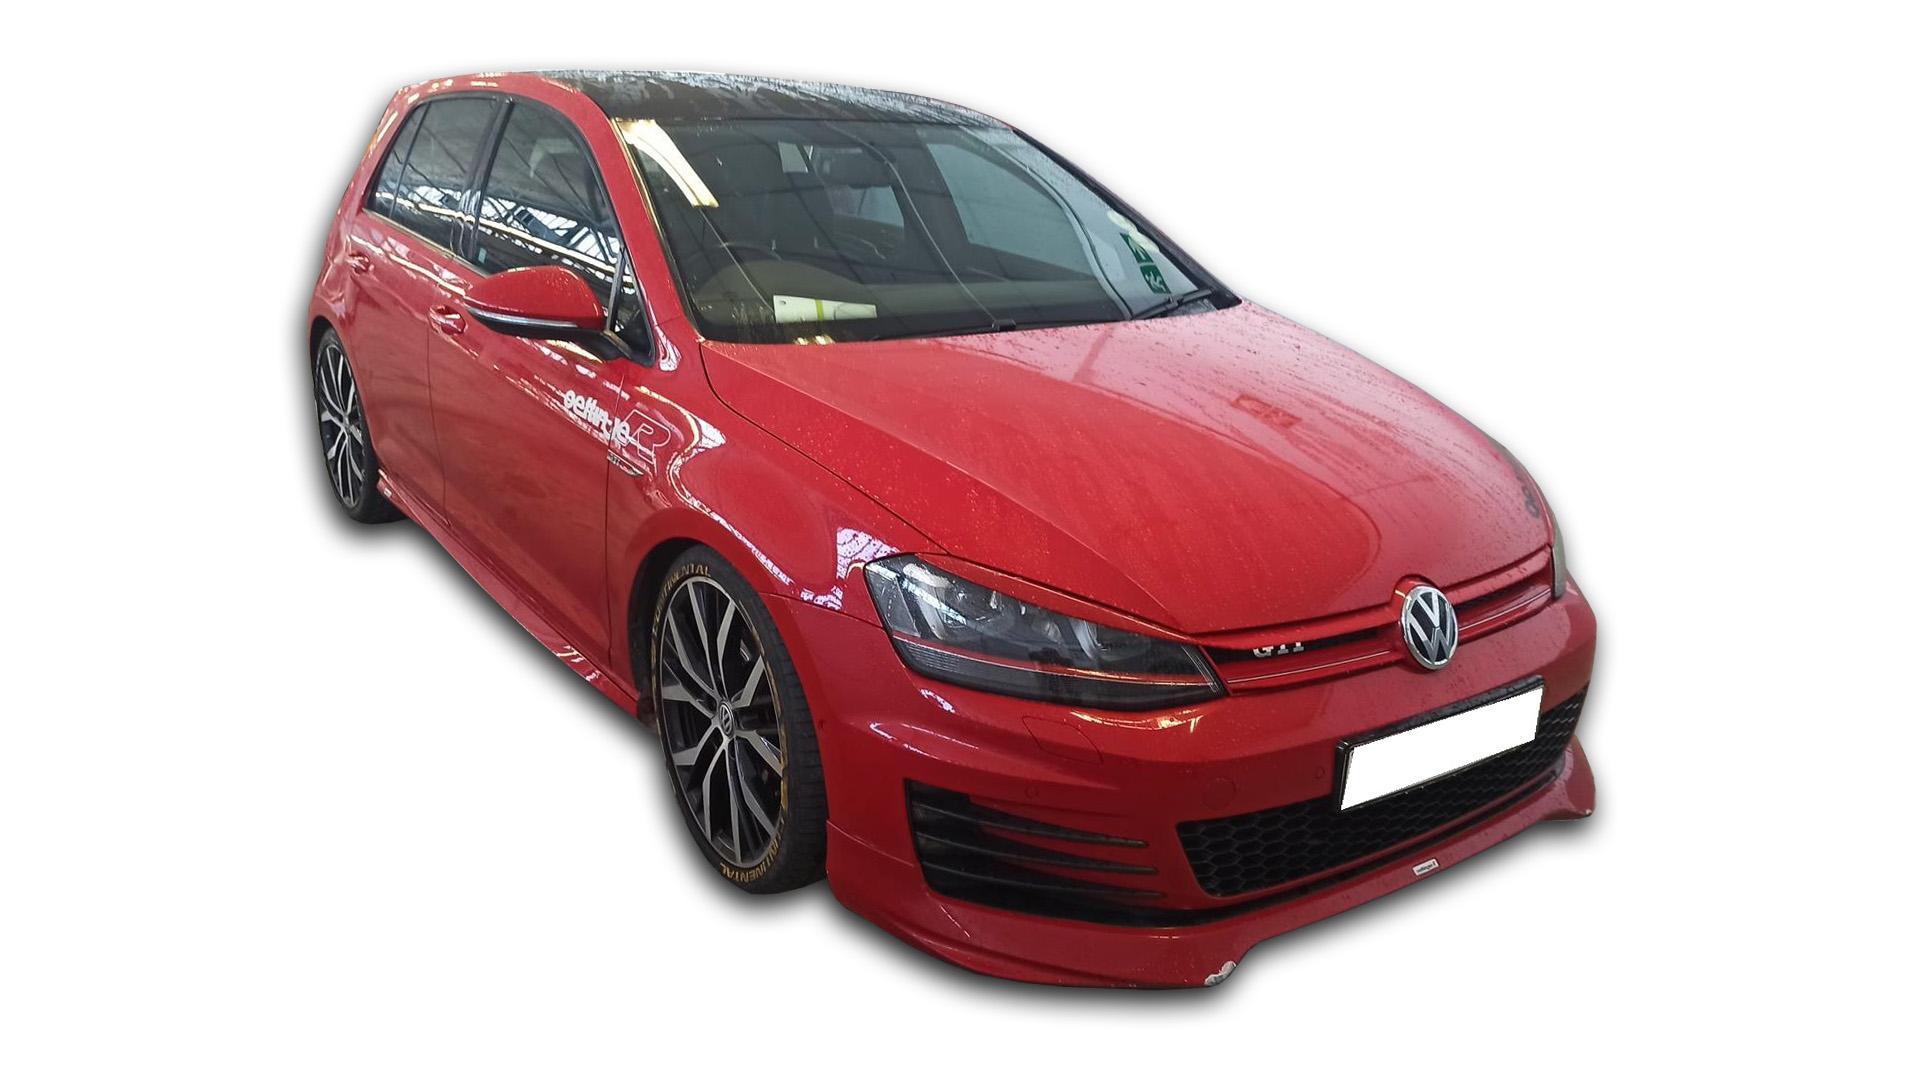 Volkswagen Golf Vii Gti 2.0 TS